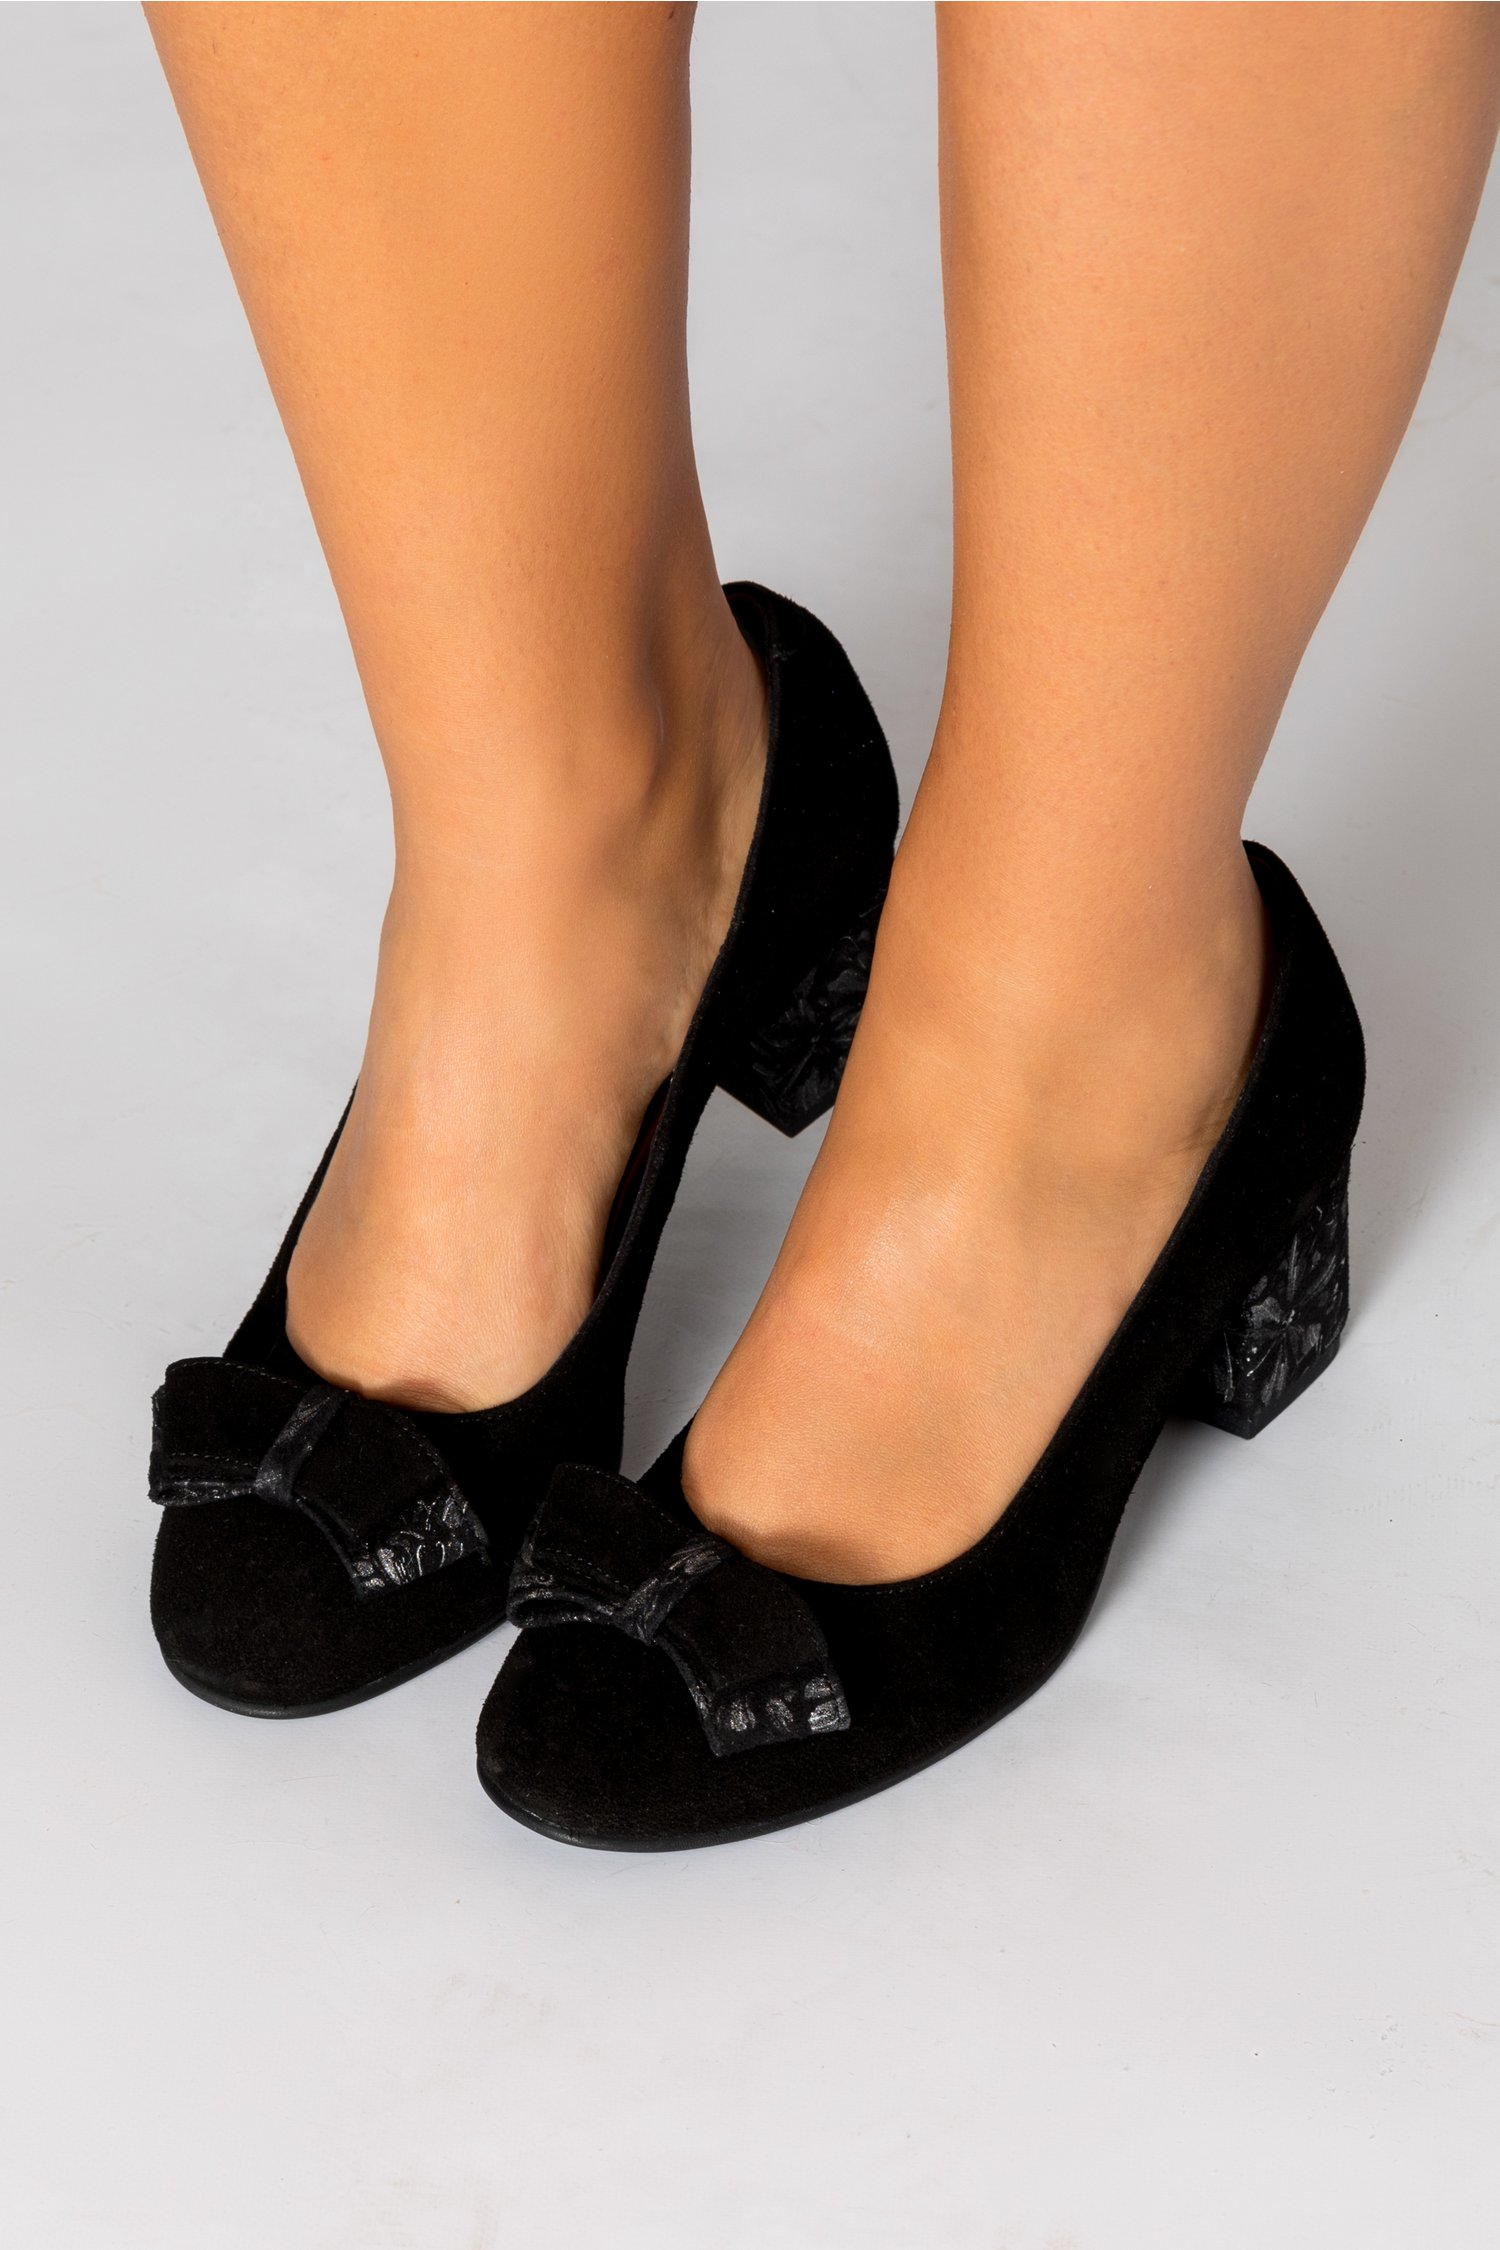 Pantofi Osir negrii cu detalii florale pe toc si funda